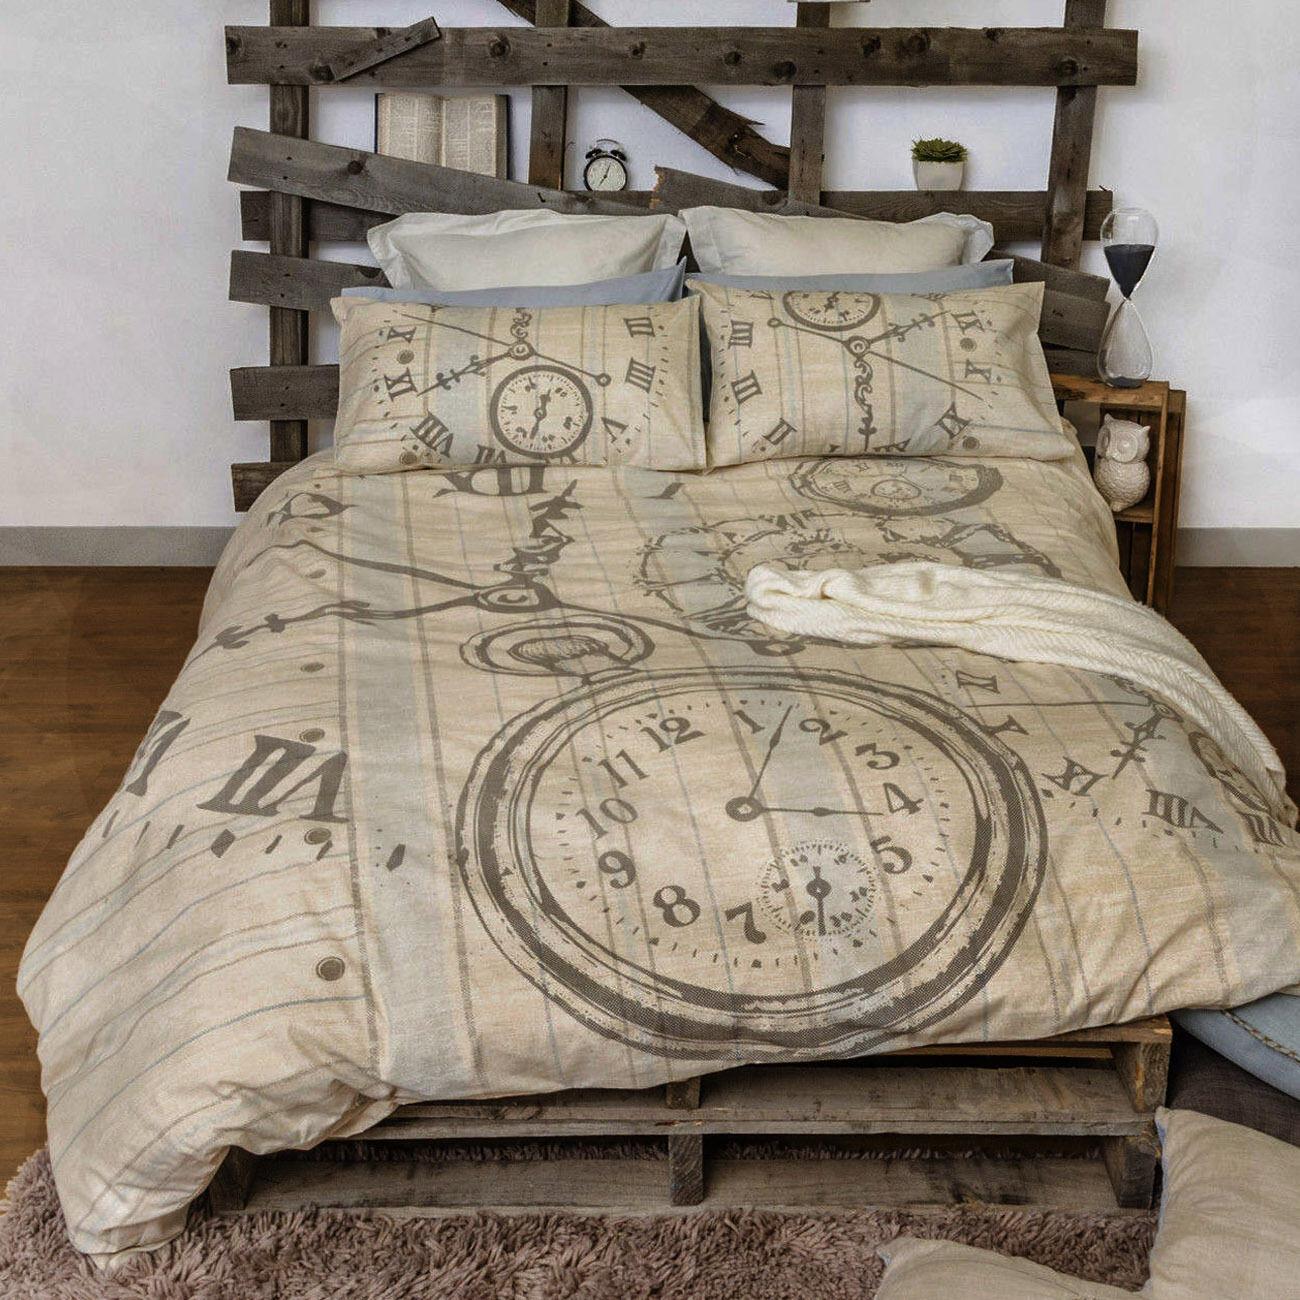 Bedtime Neutral Duvet   Doona Quilt Cover Set   Retro Home   Nostalgic & Gentle